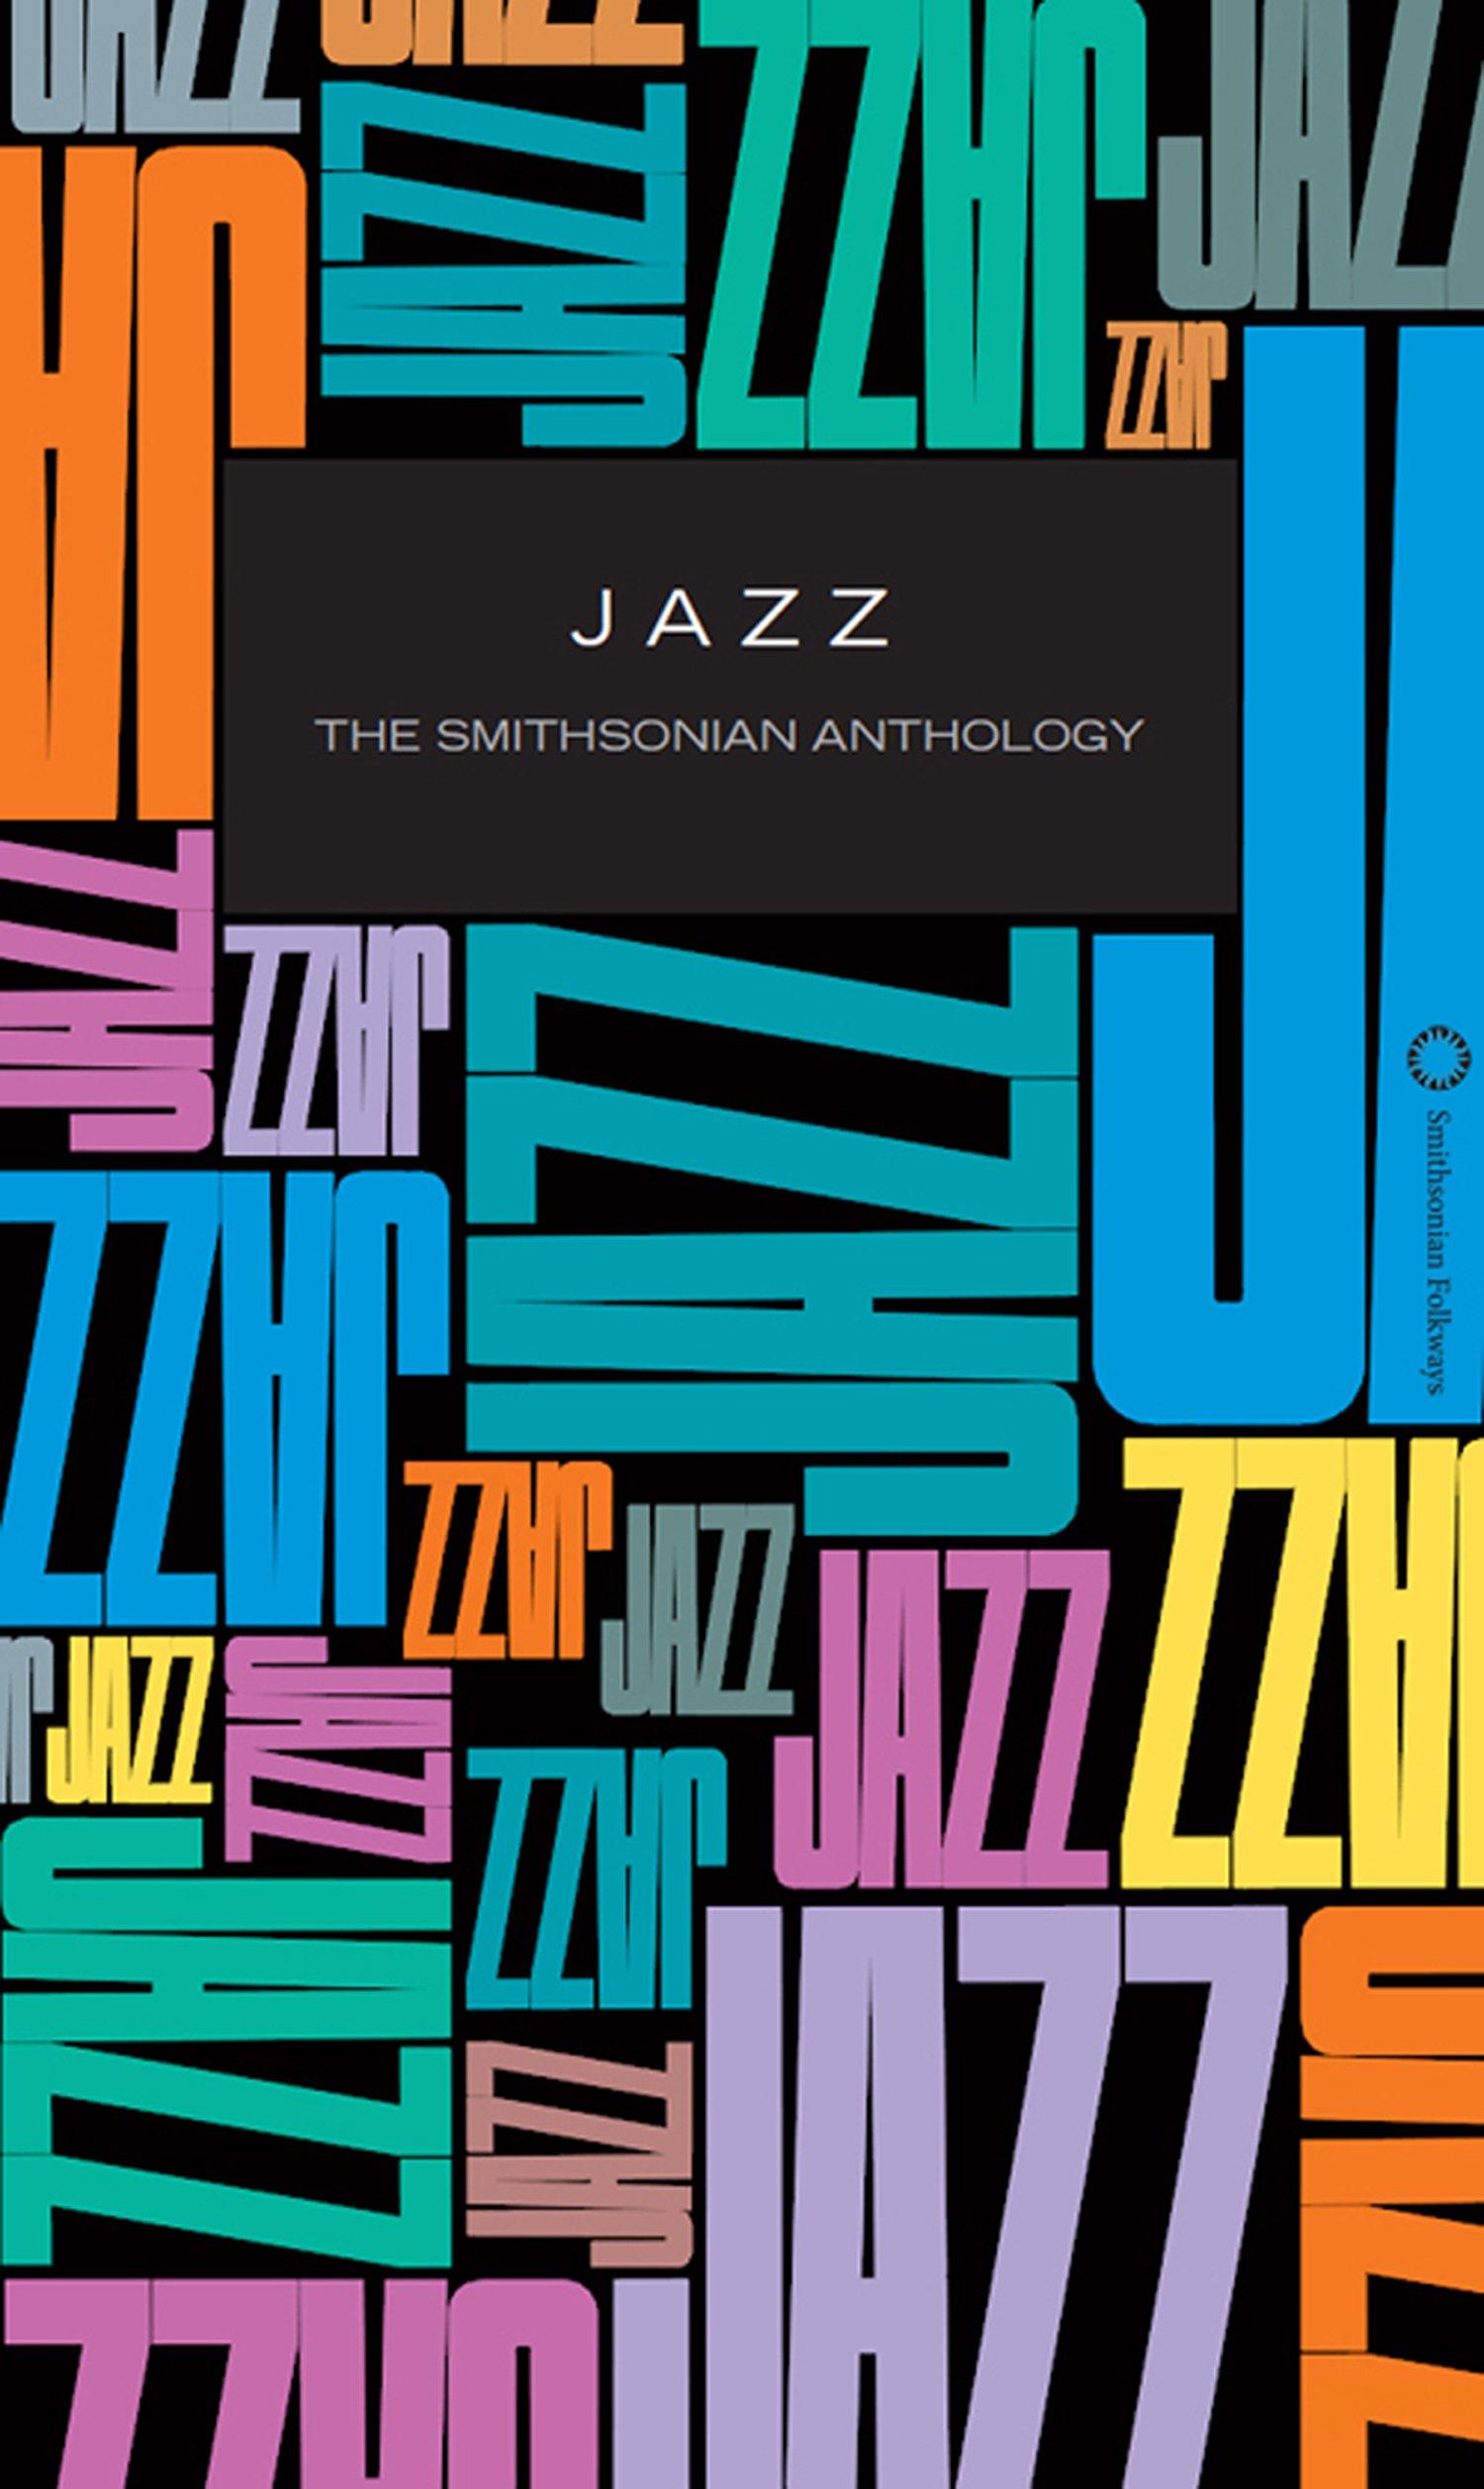 JAZZ: The Smithsonian Anthology by Smithsonian Folkways Recordings